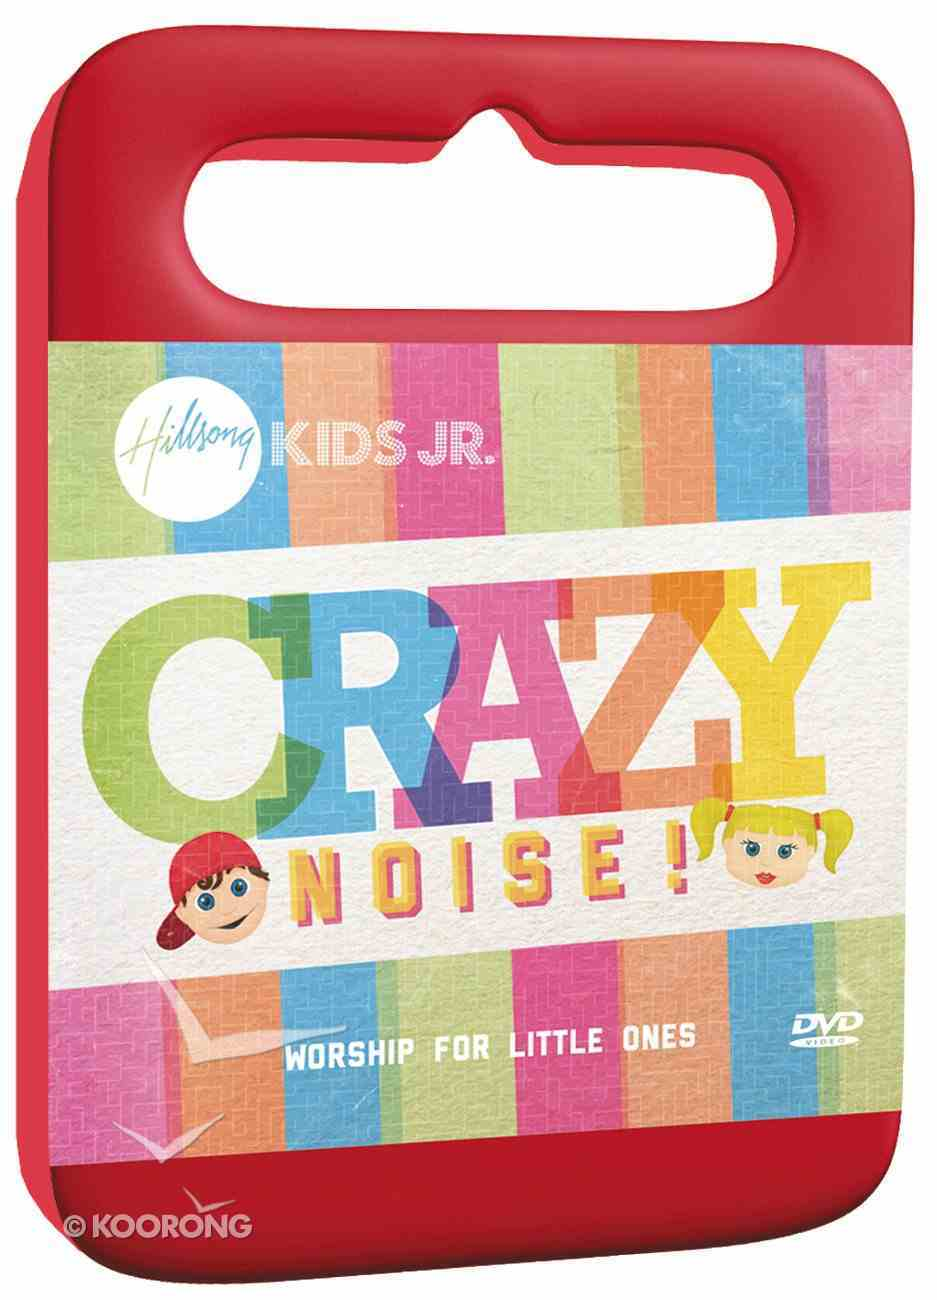 Hillsong Kids 2012: Crazy Noise DVD